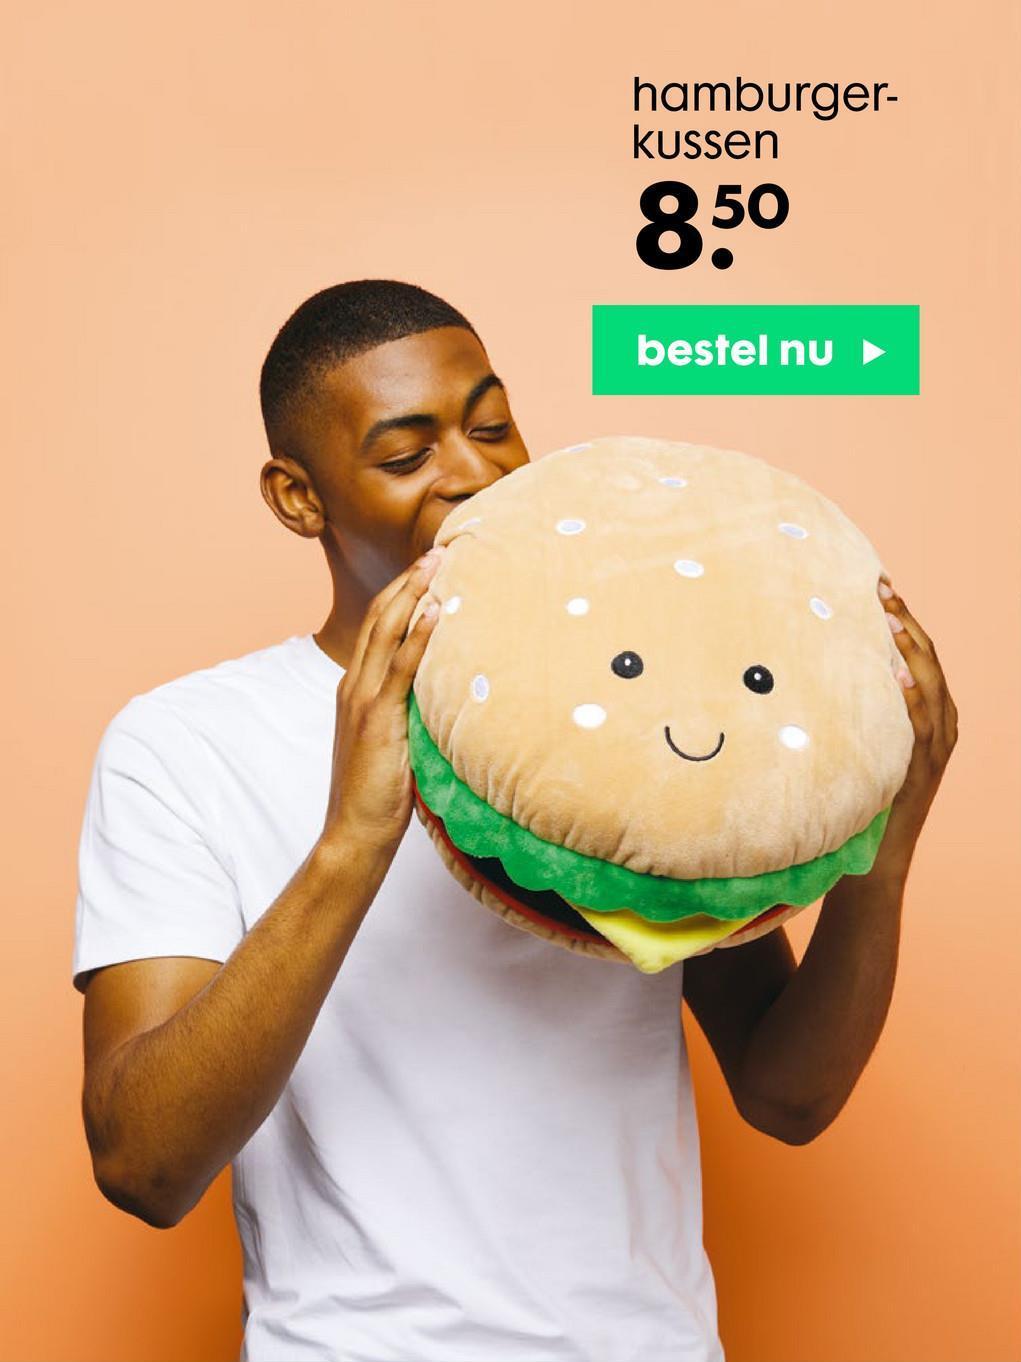 hamburger- kussen 850 bestel nu